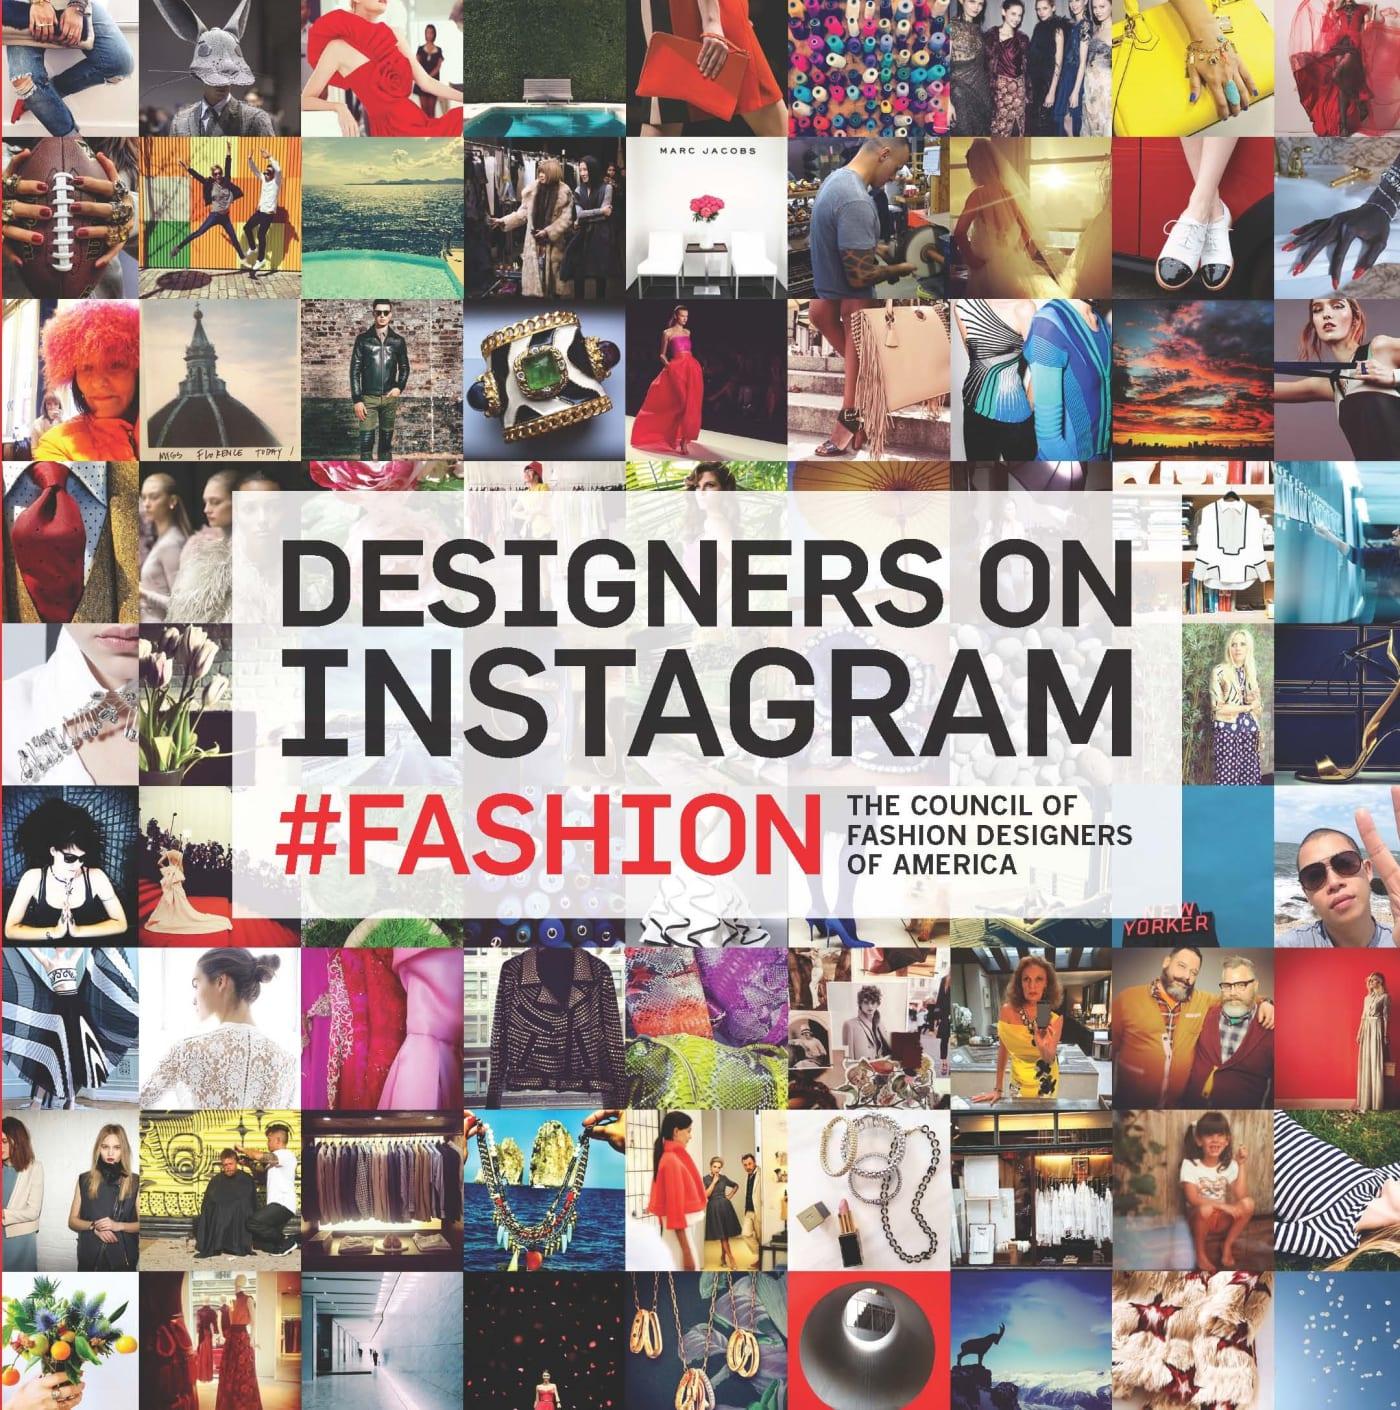 Designers On Instagram #Fashion Book